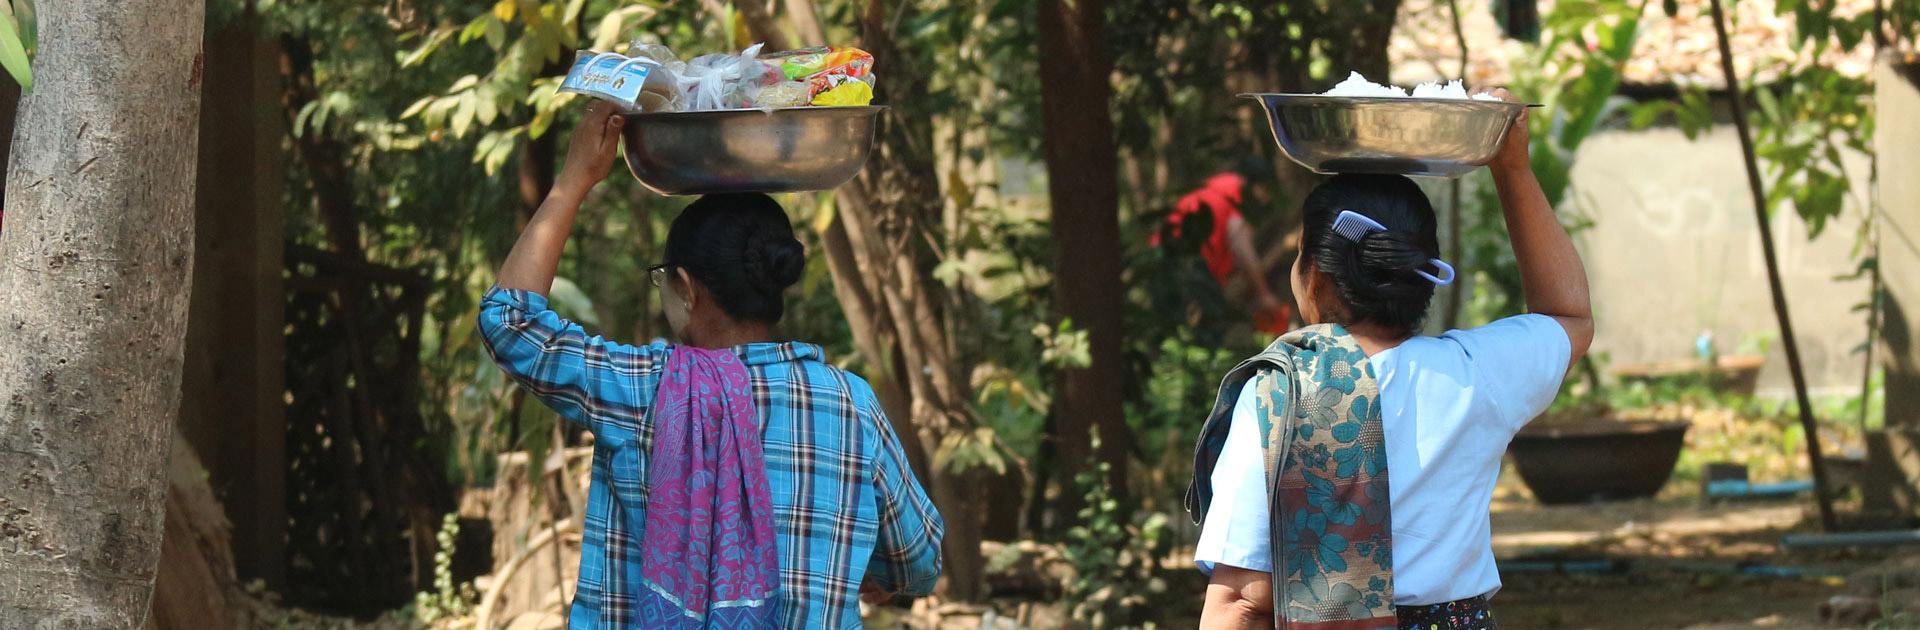 MM Myanmar Tierra Sagrada 17 días 3 1